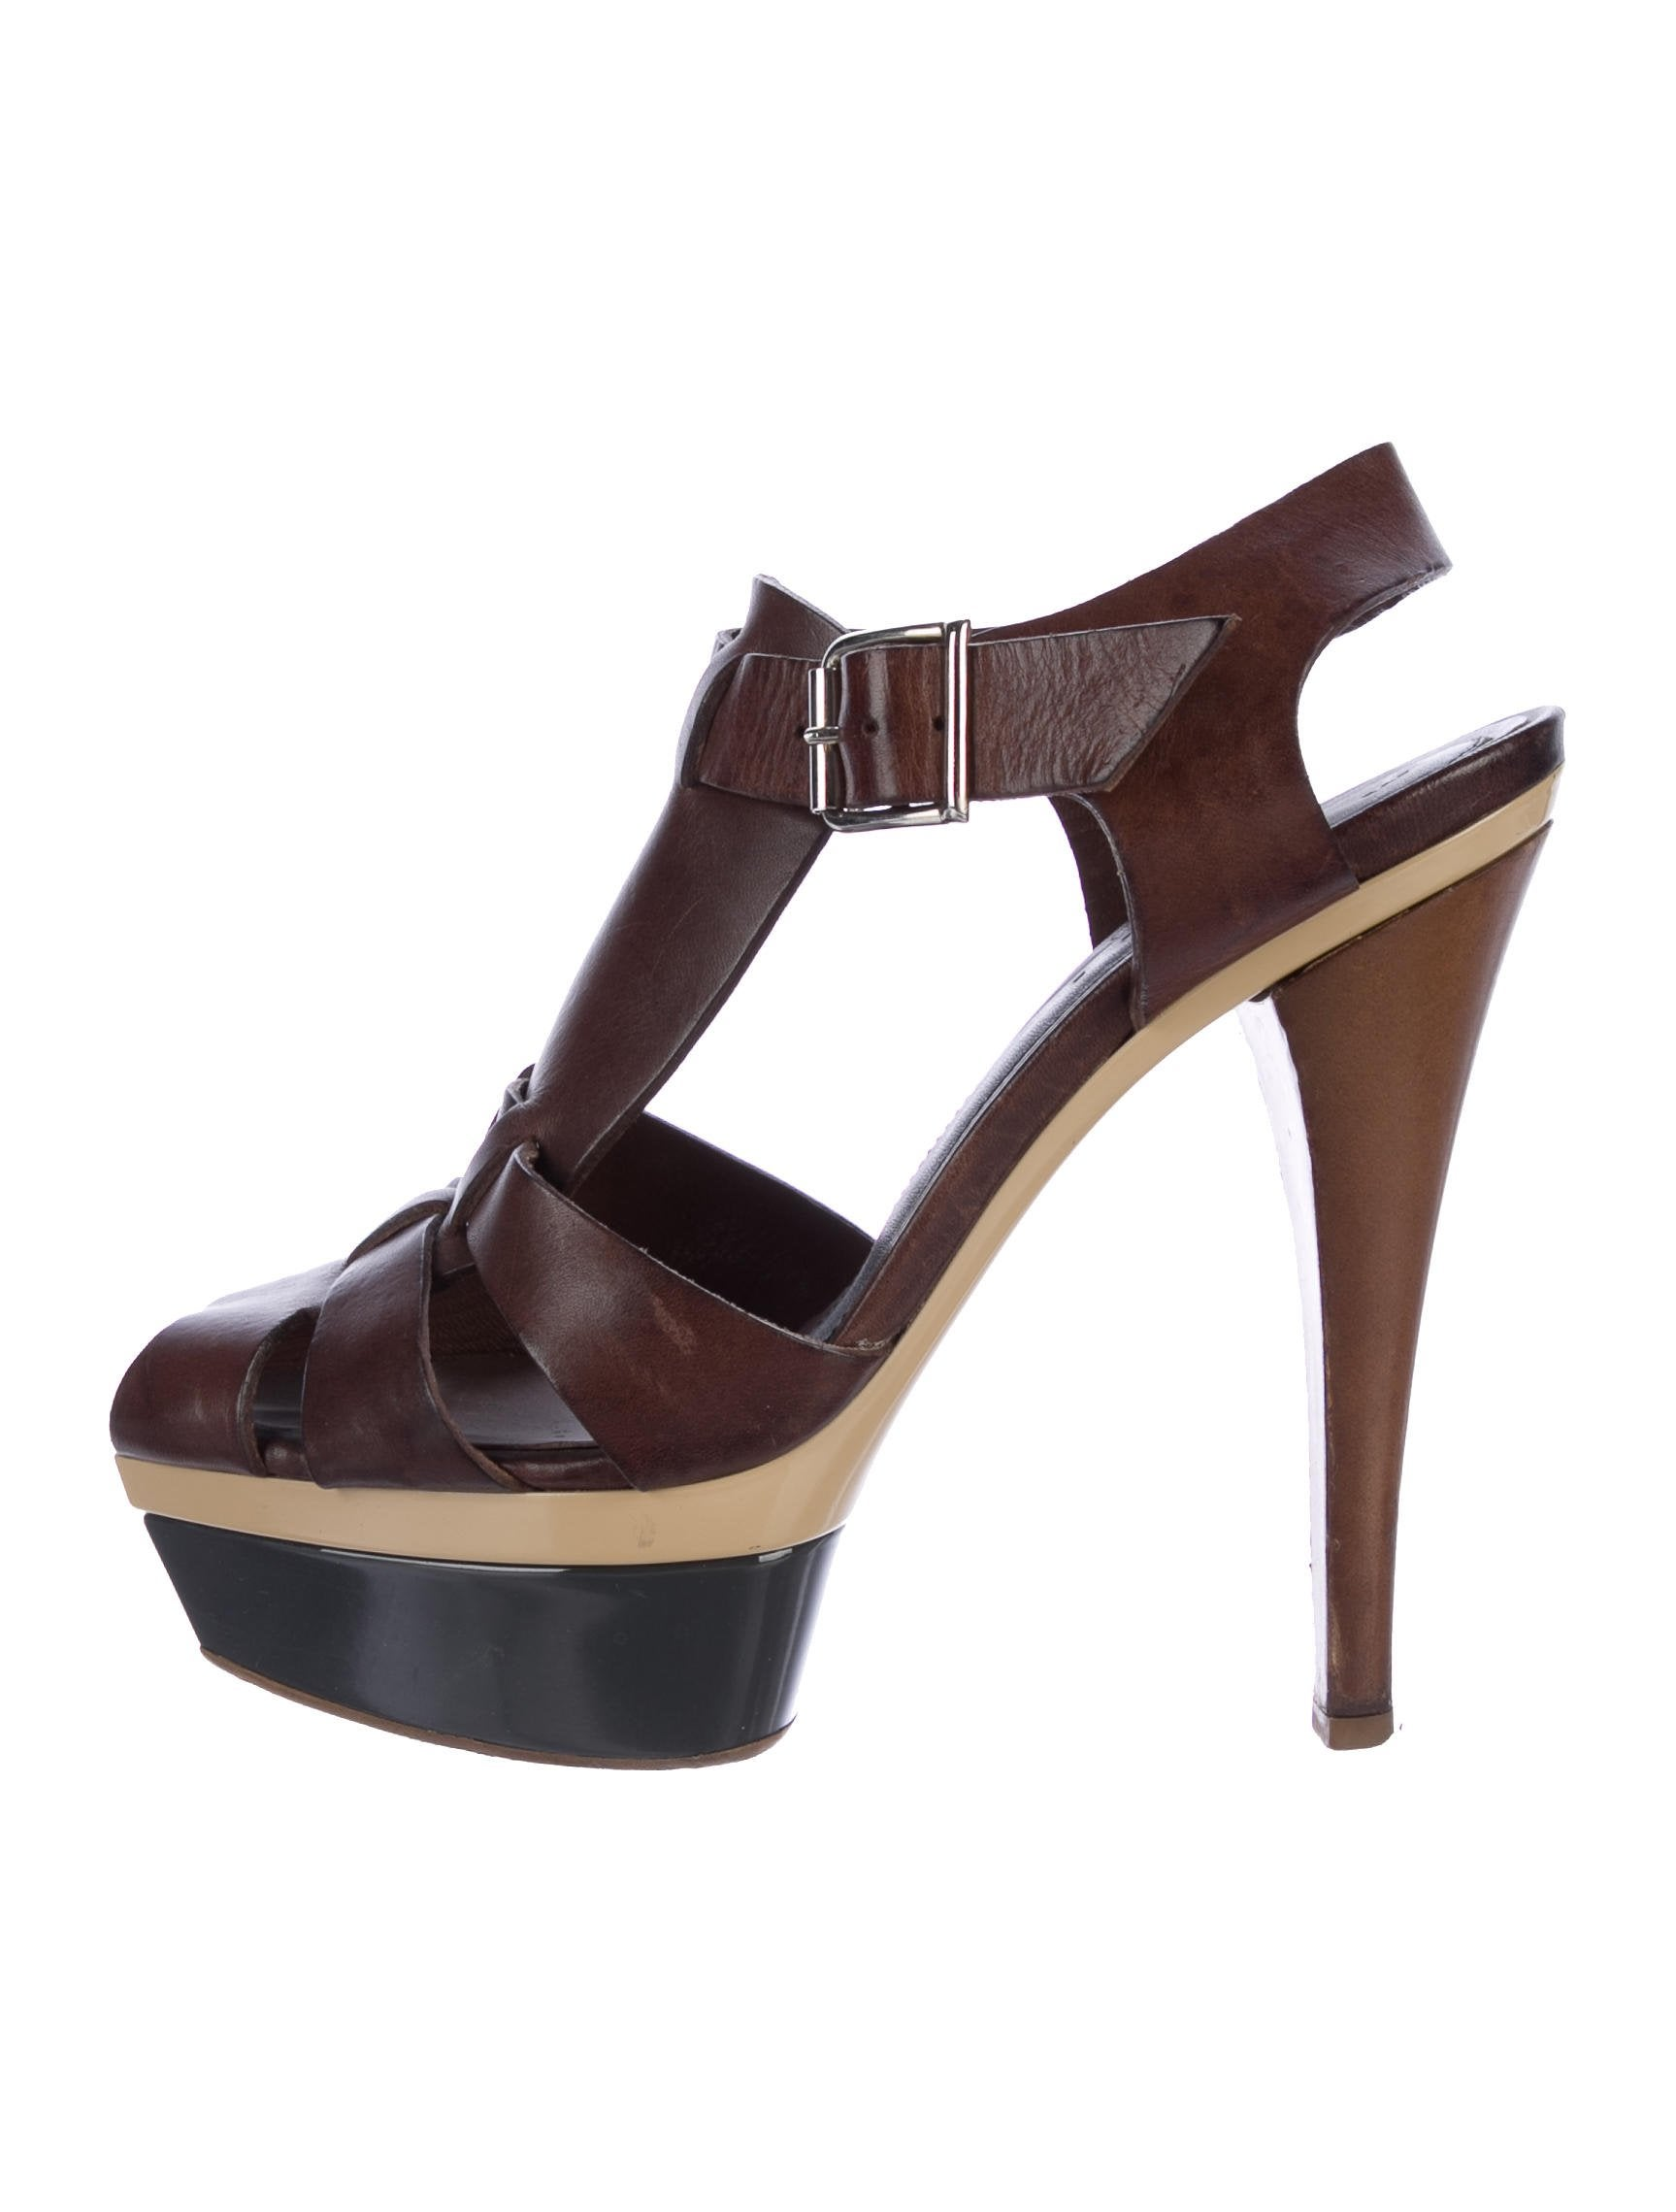 Marni Platform Square-Toe Sandals low price order KfOhJxK